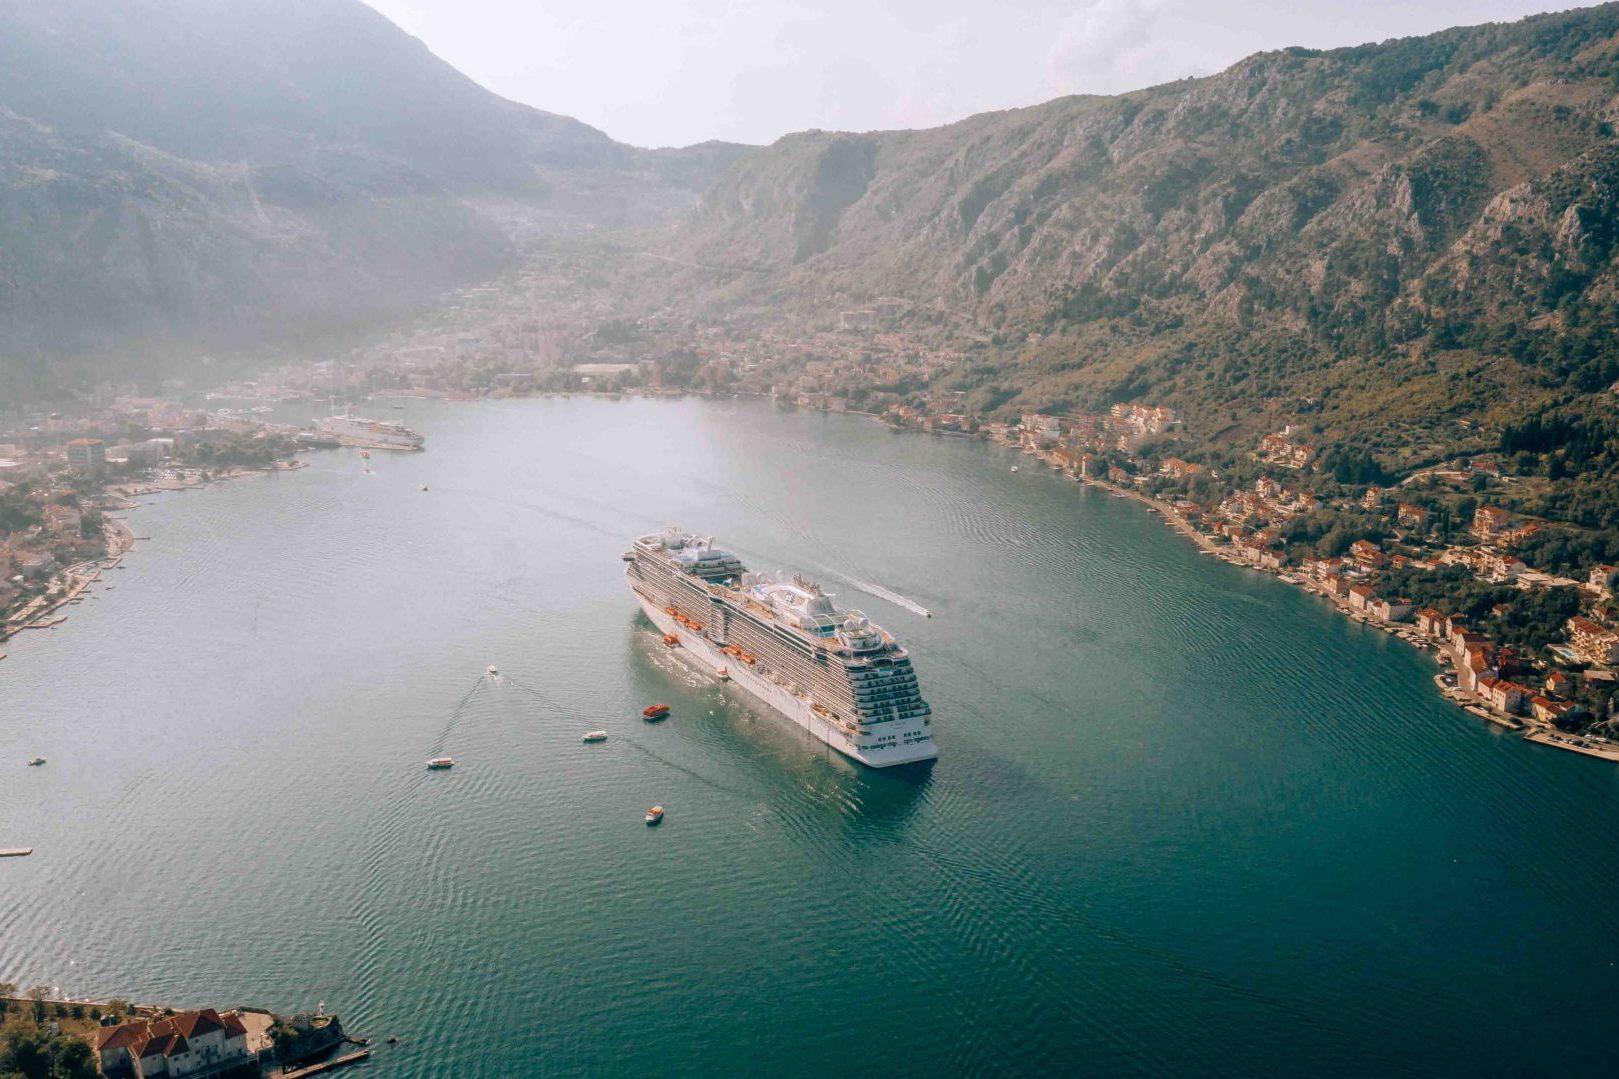 Princess cruises views